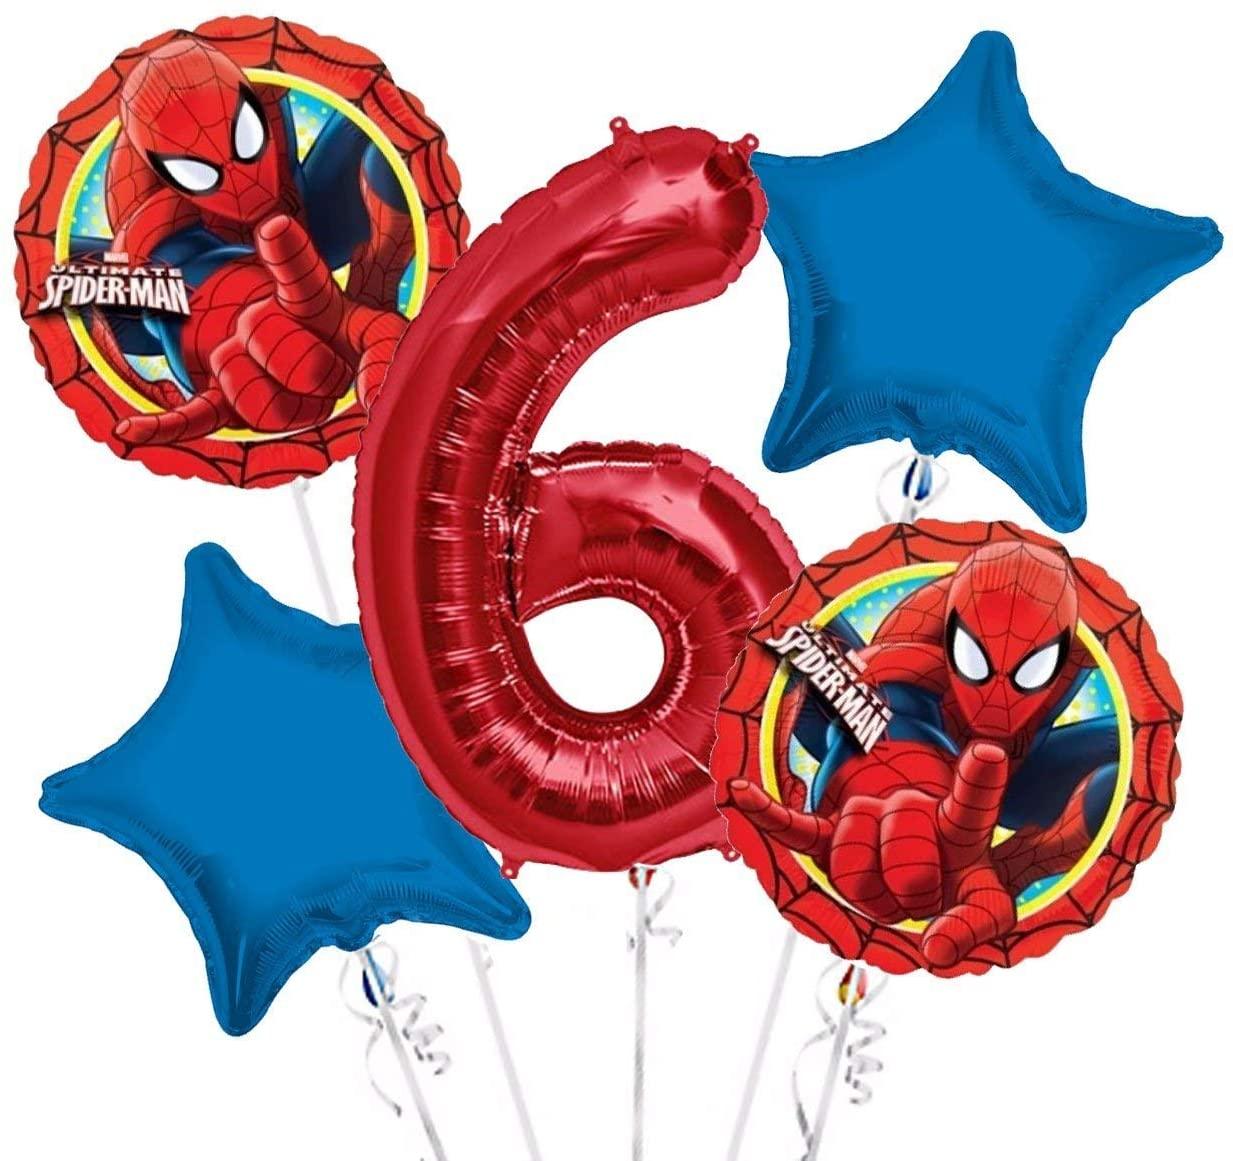 Spiderman Balloon Bouquet 6th Birthday 5 pcs - Party Supplies